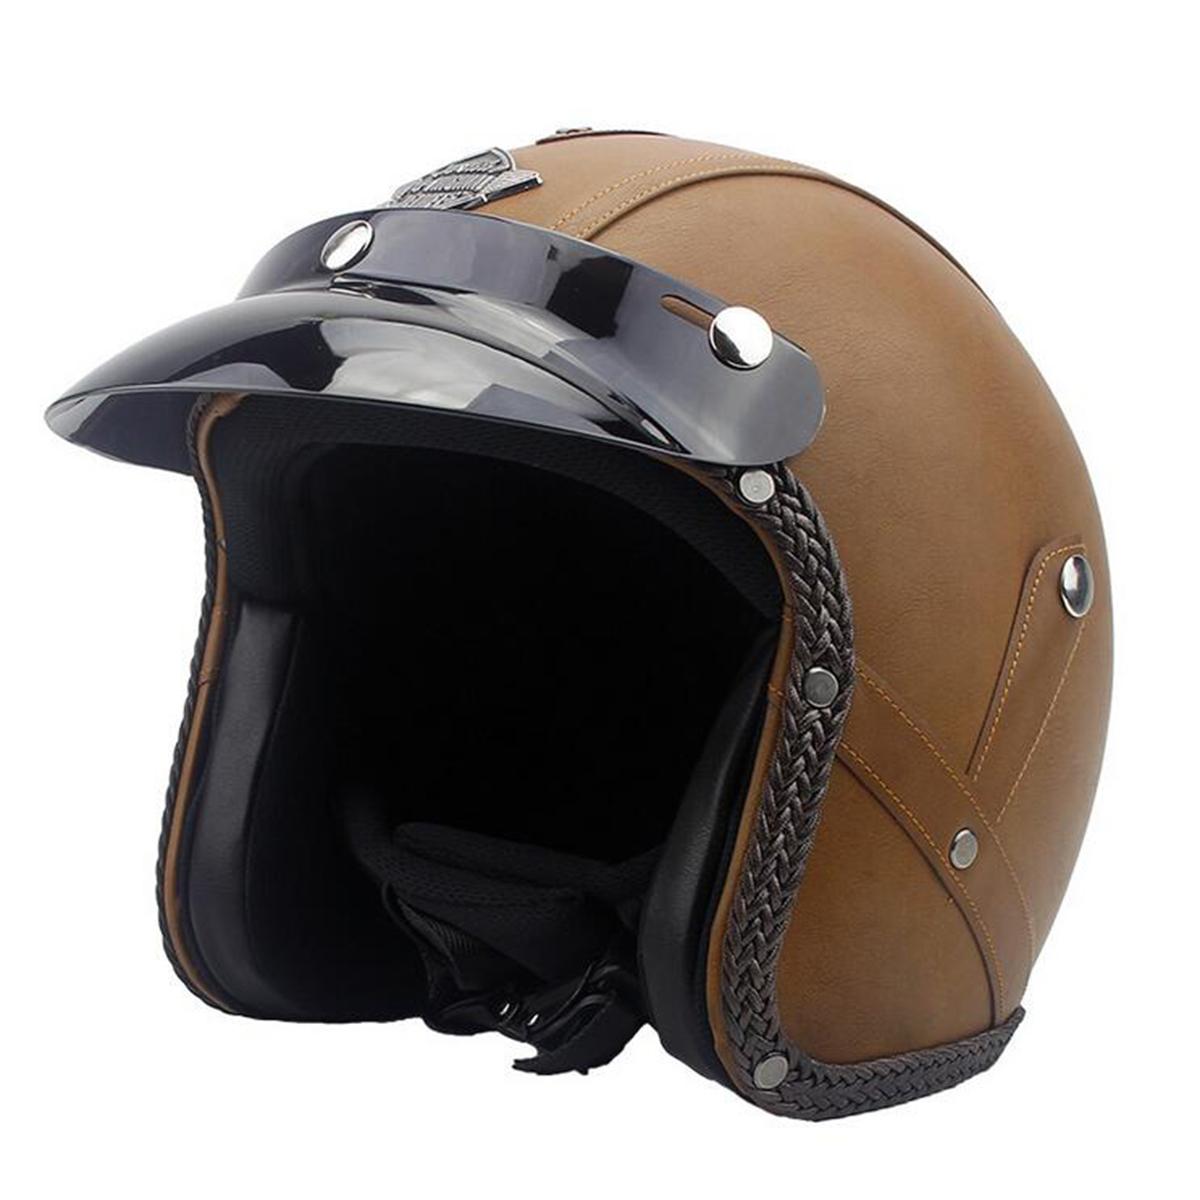 DOT 3/4 Face Vintage Leather Motorcycle Helmet Motorbike ...